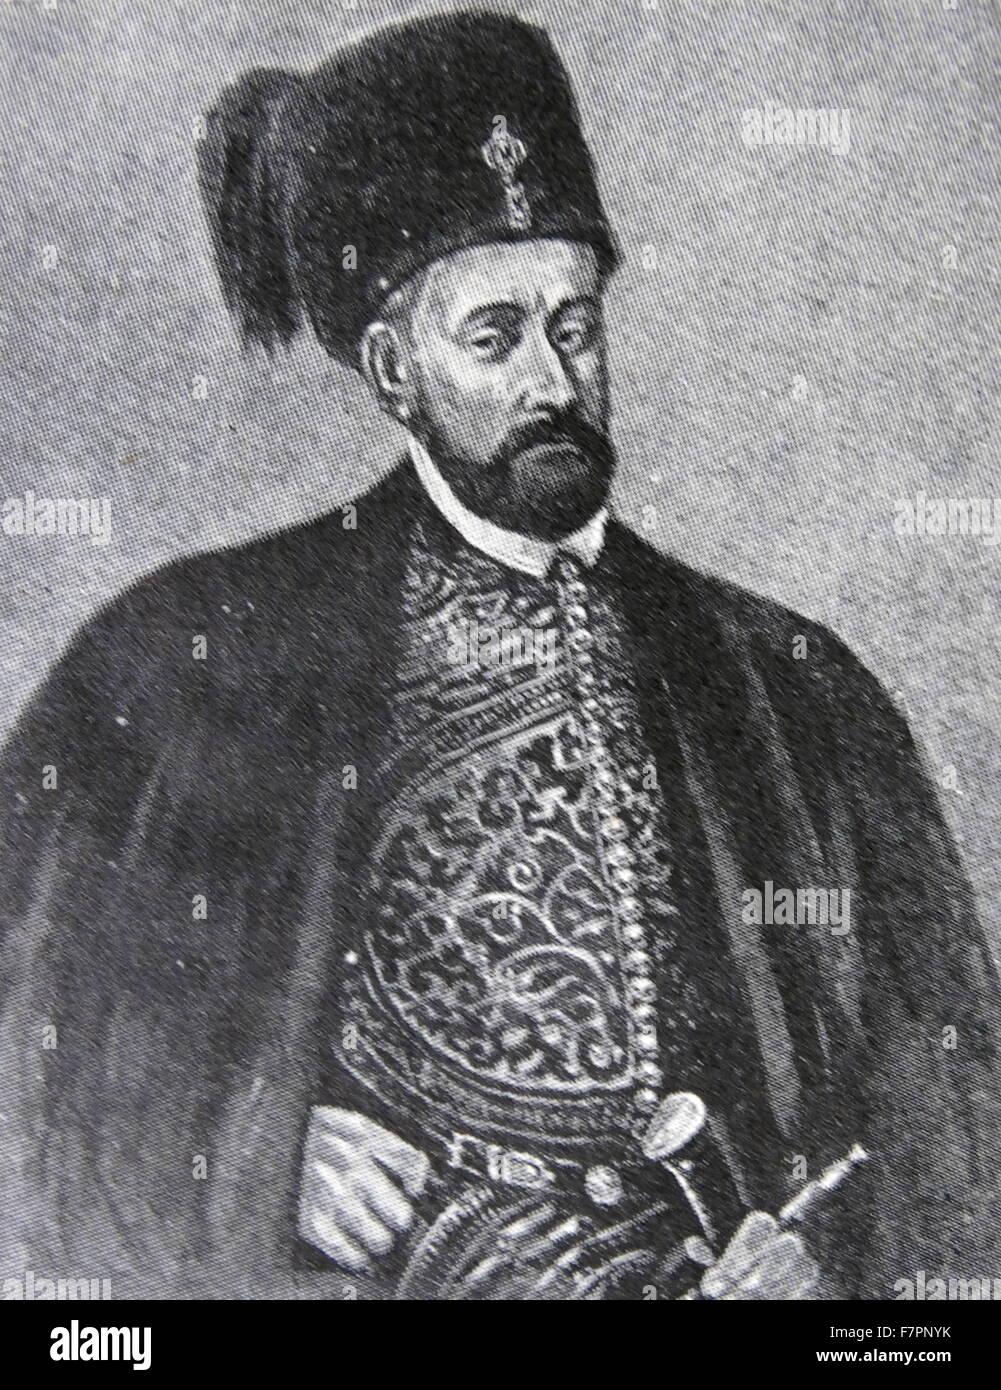 Portrait of Stephen Báthory (1533-1586) Voivode of Transylvania, Prince of Transylvania, from 1576 Queen Anna - Stock Image